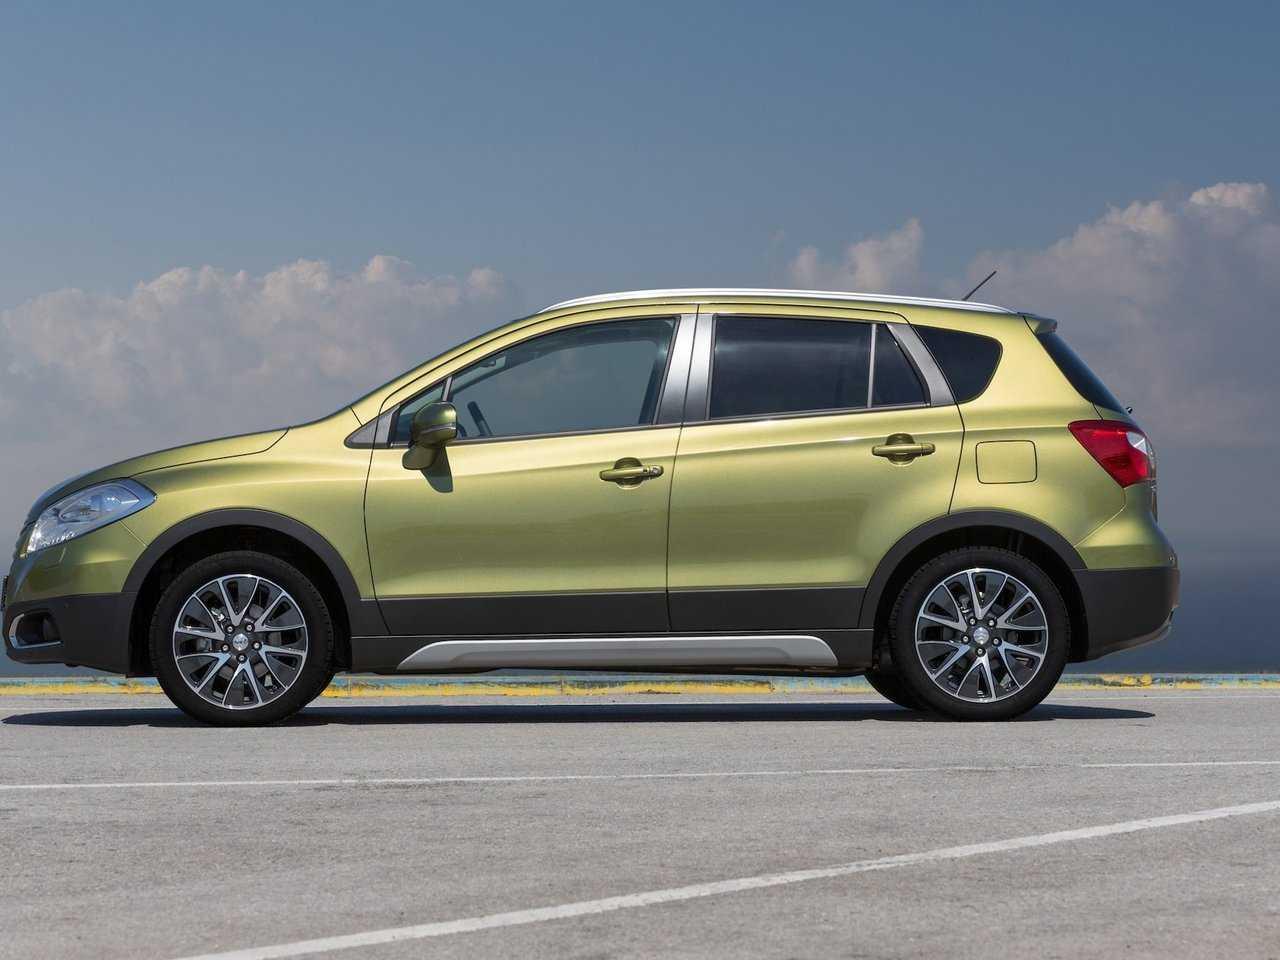 Suzuki sx4 2019-2020 цена, технические характеристики, фото, видео тест-драйв сх4